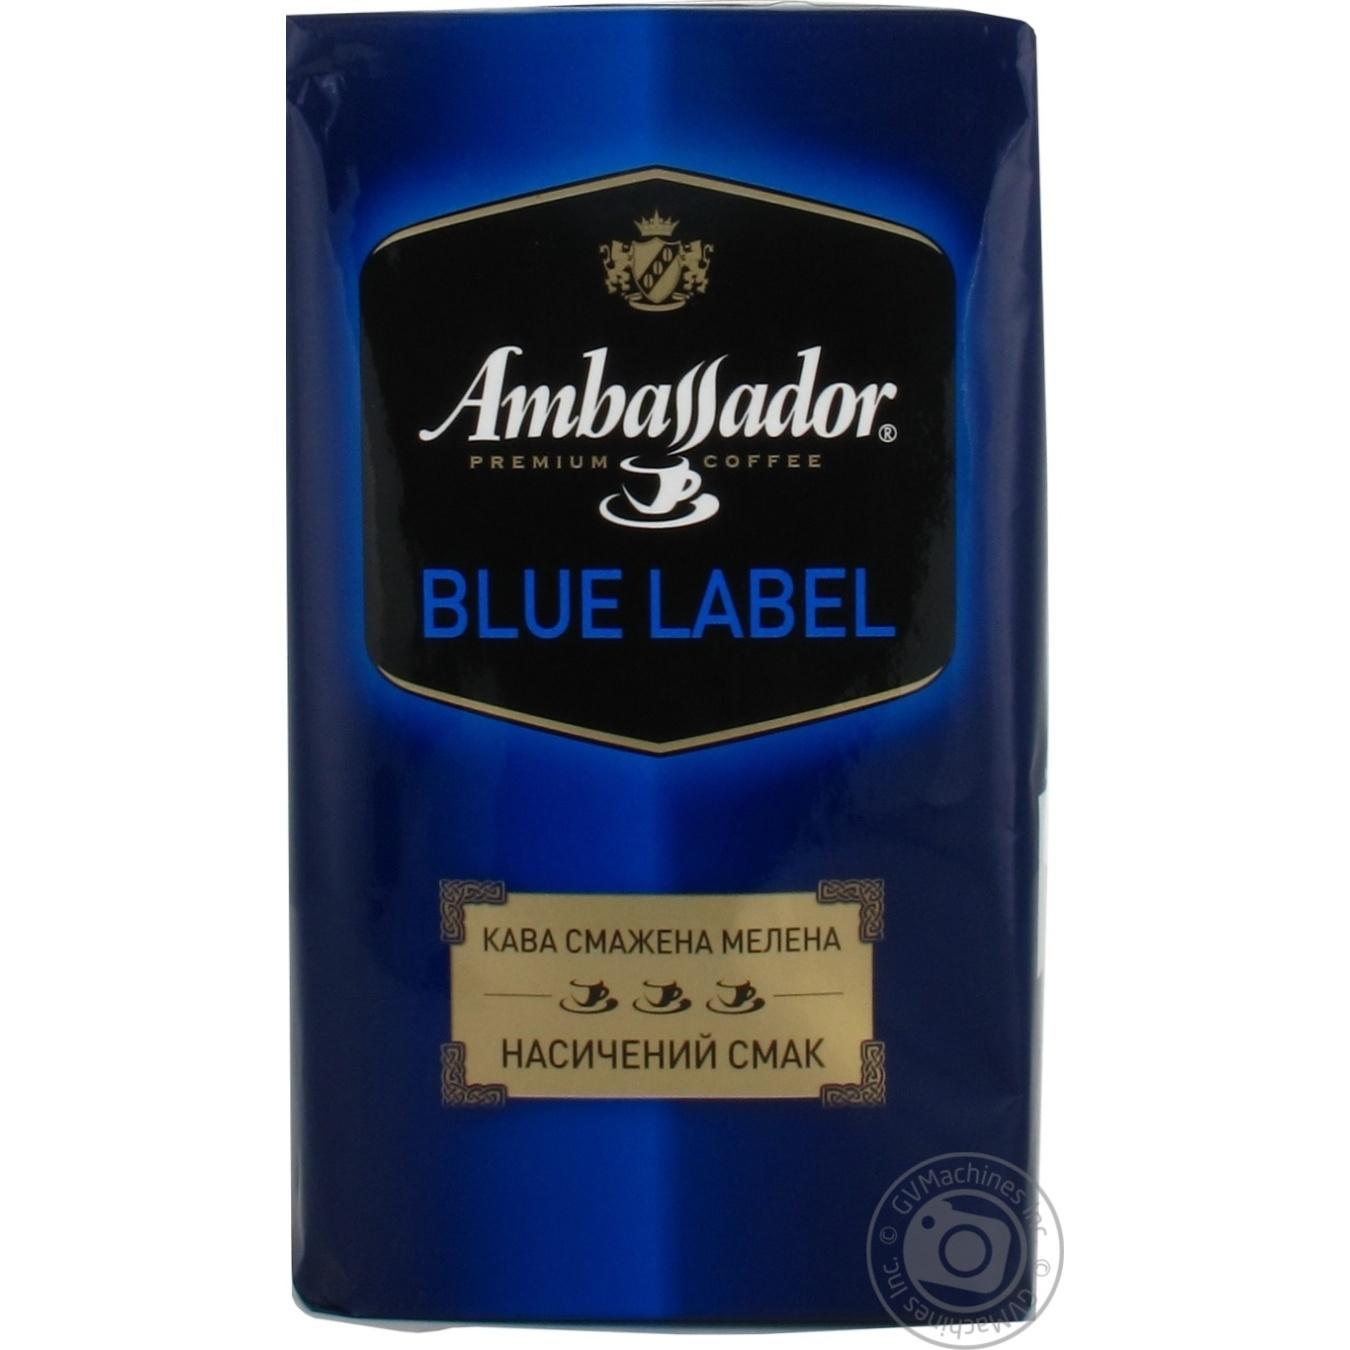 AMBASSADOR МЕЛ BLUE LABEL 500Г